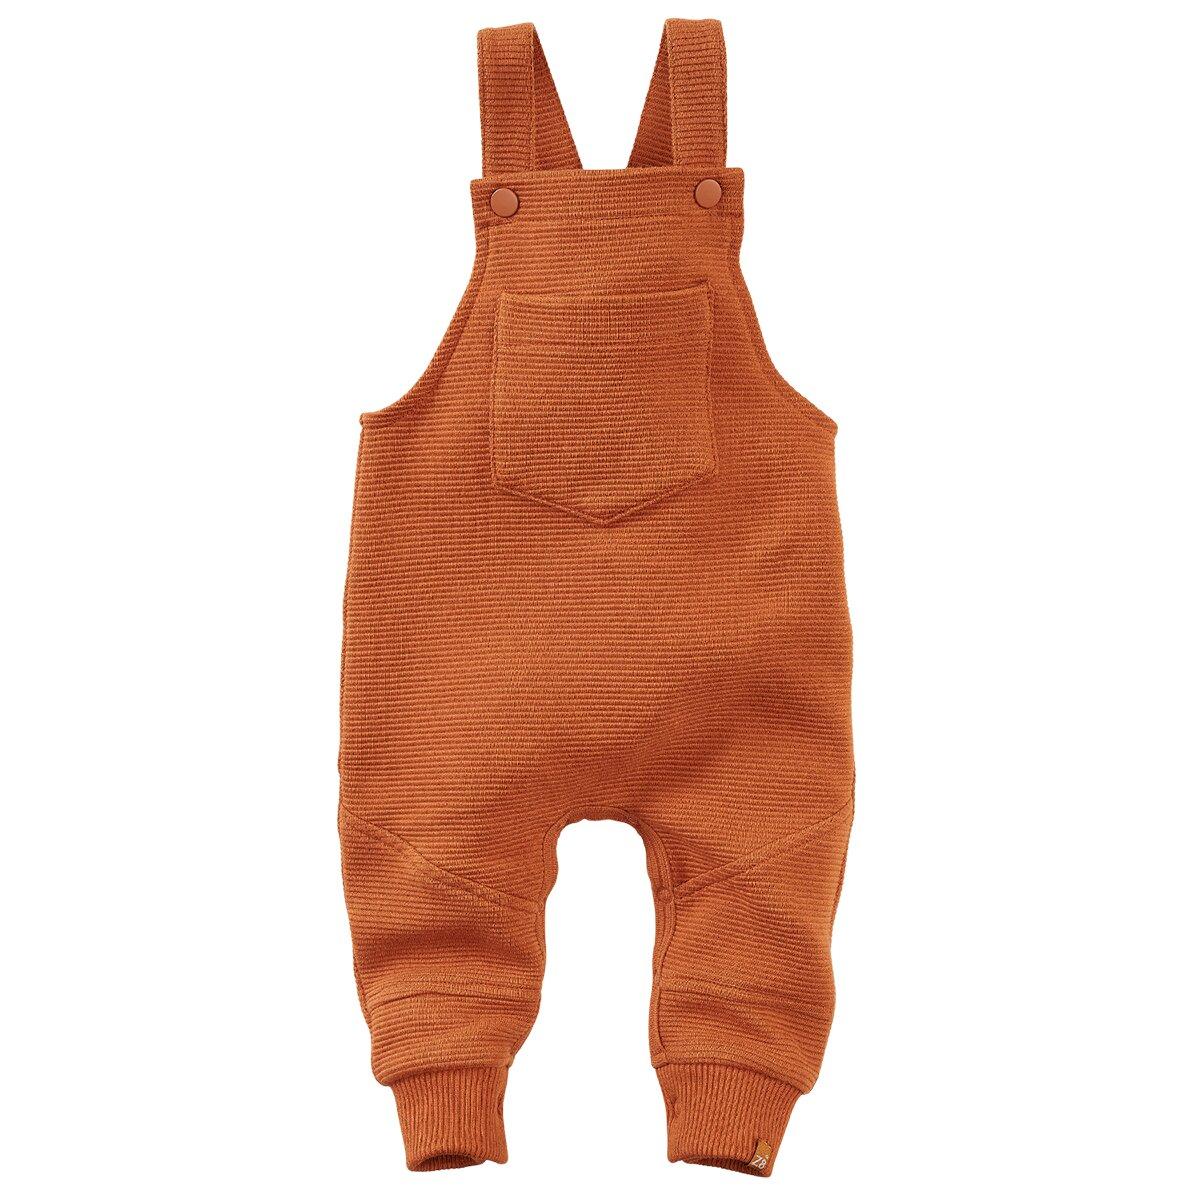 z8-newbornw20210026los-angelos